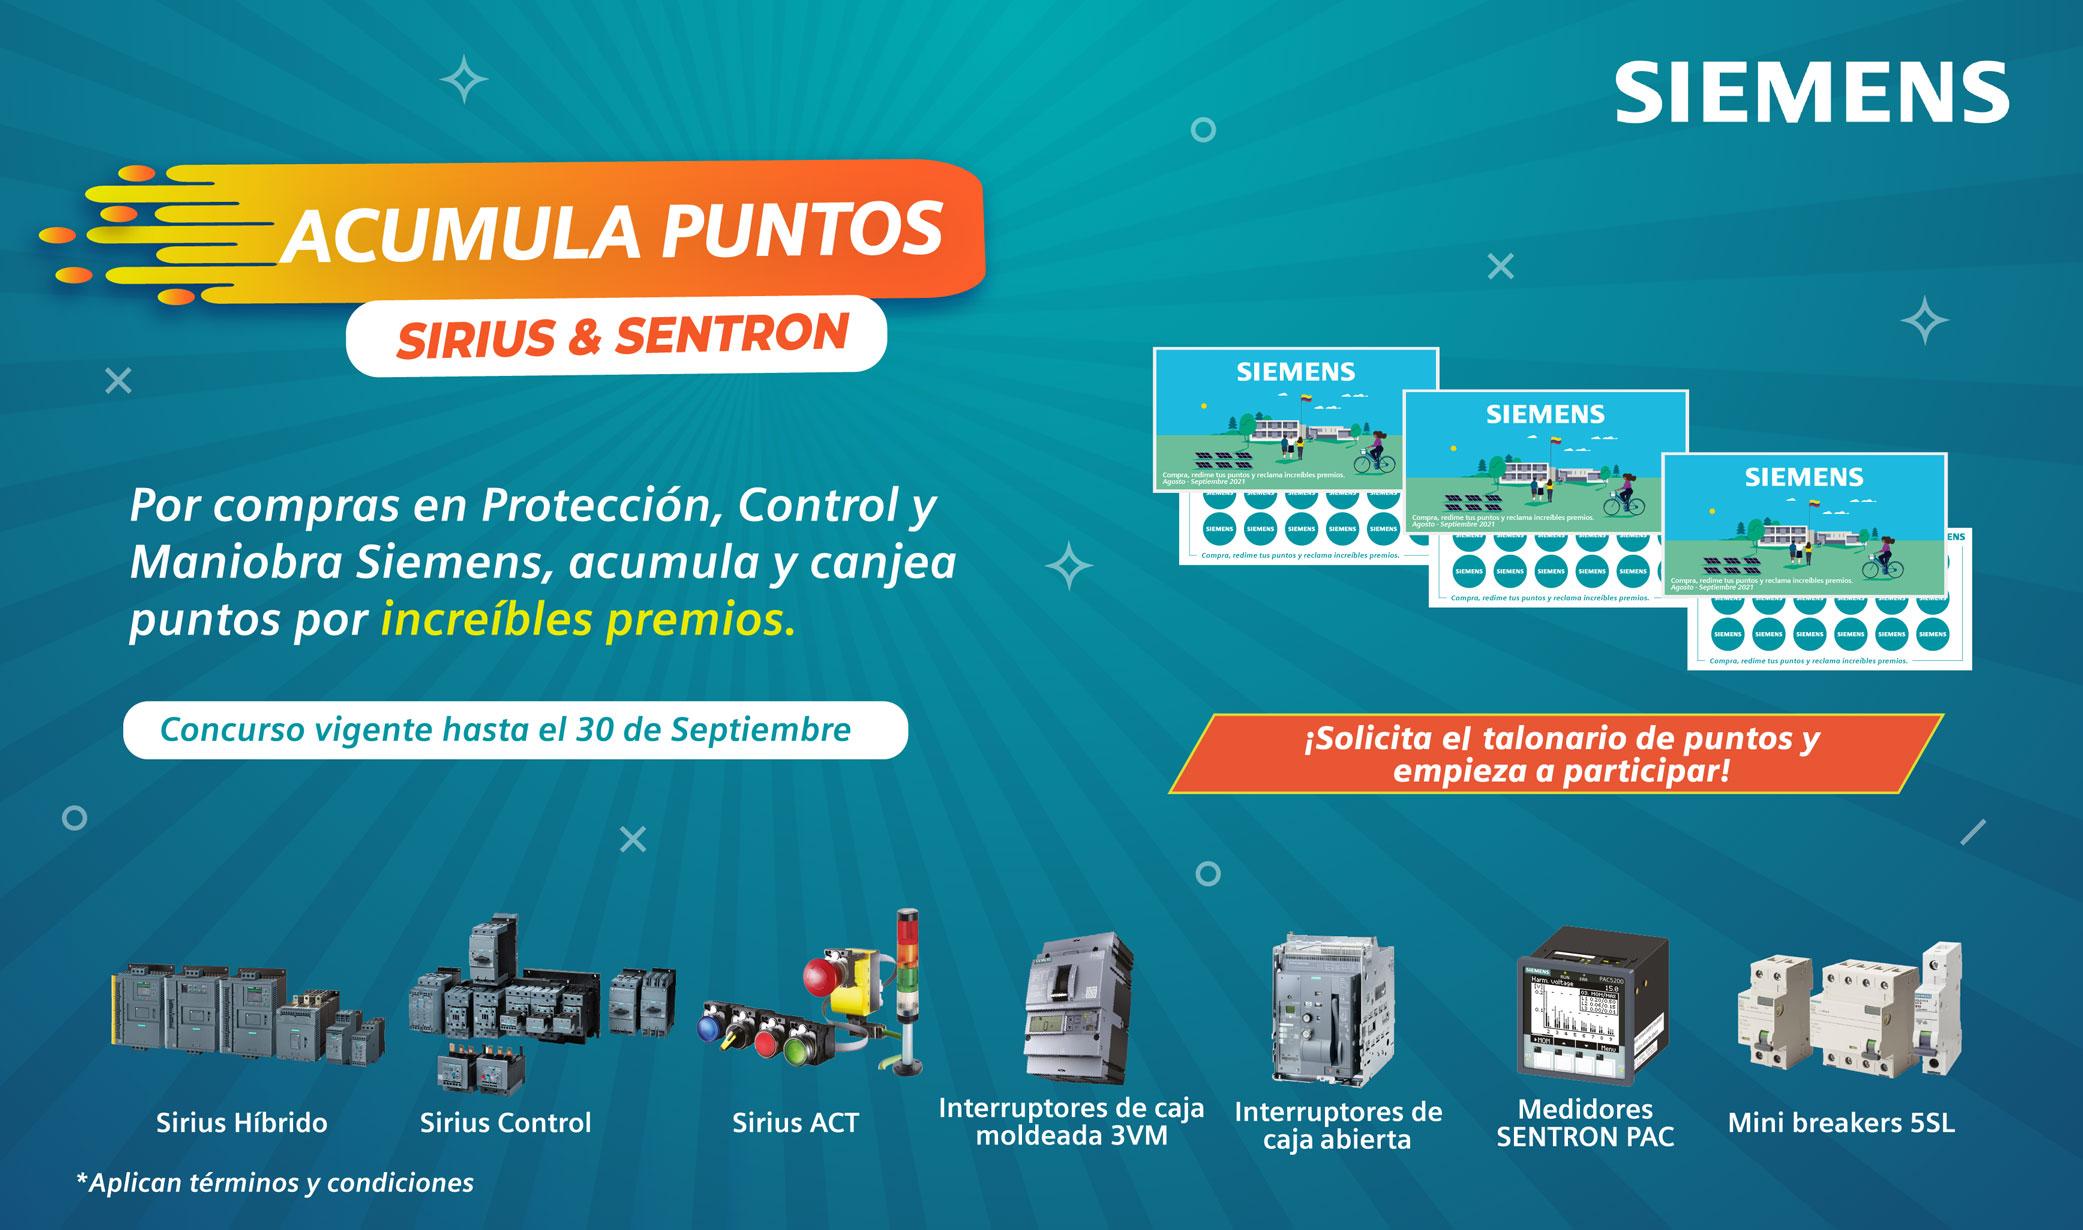 Web-Concurso-puntos-01 EIMPSA SIEMENS